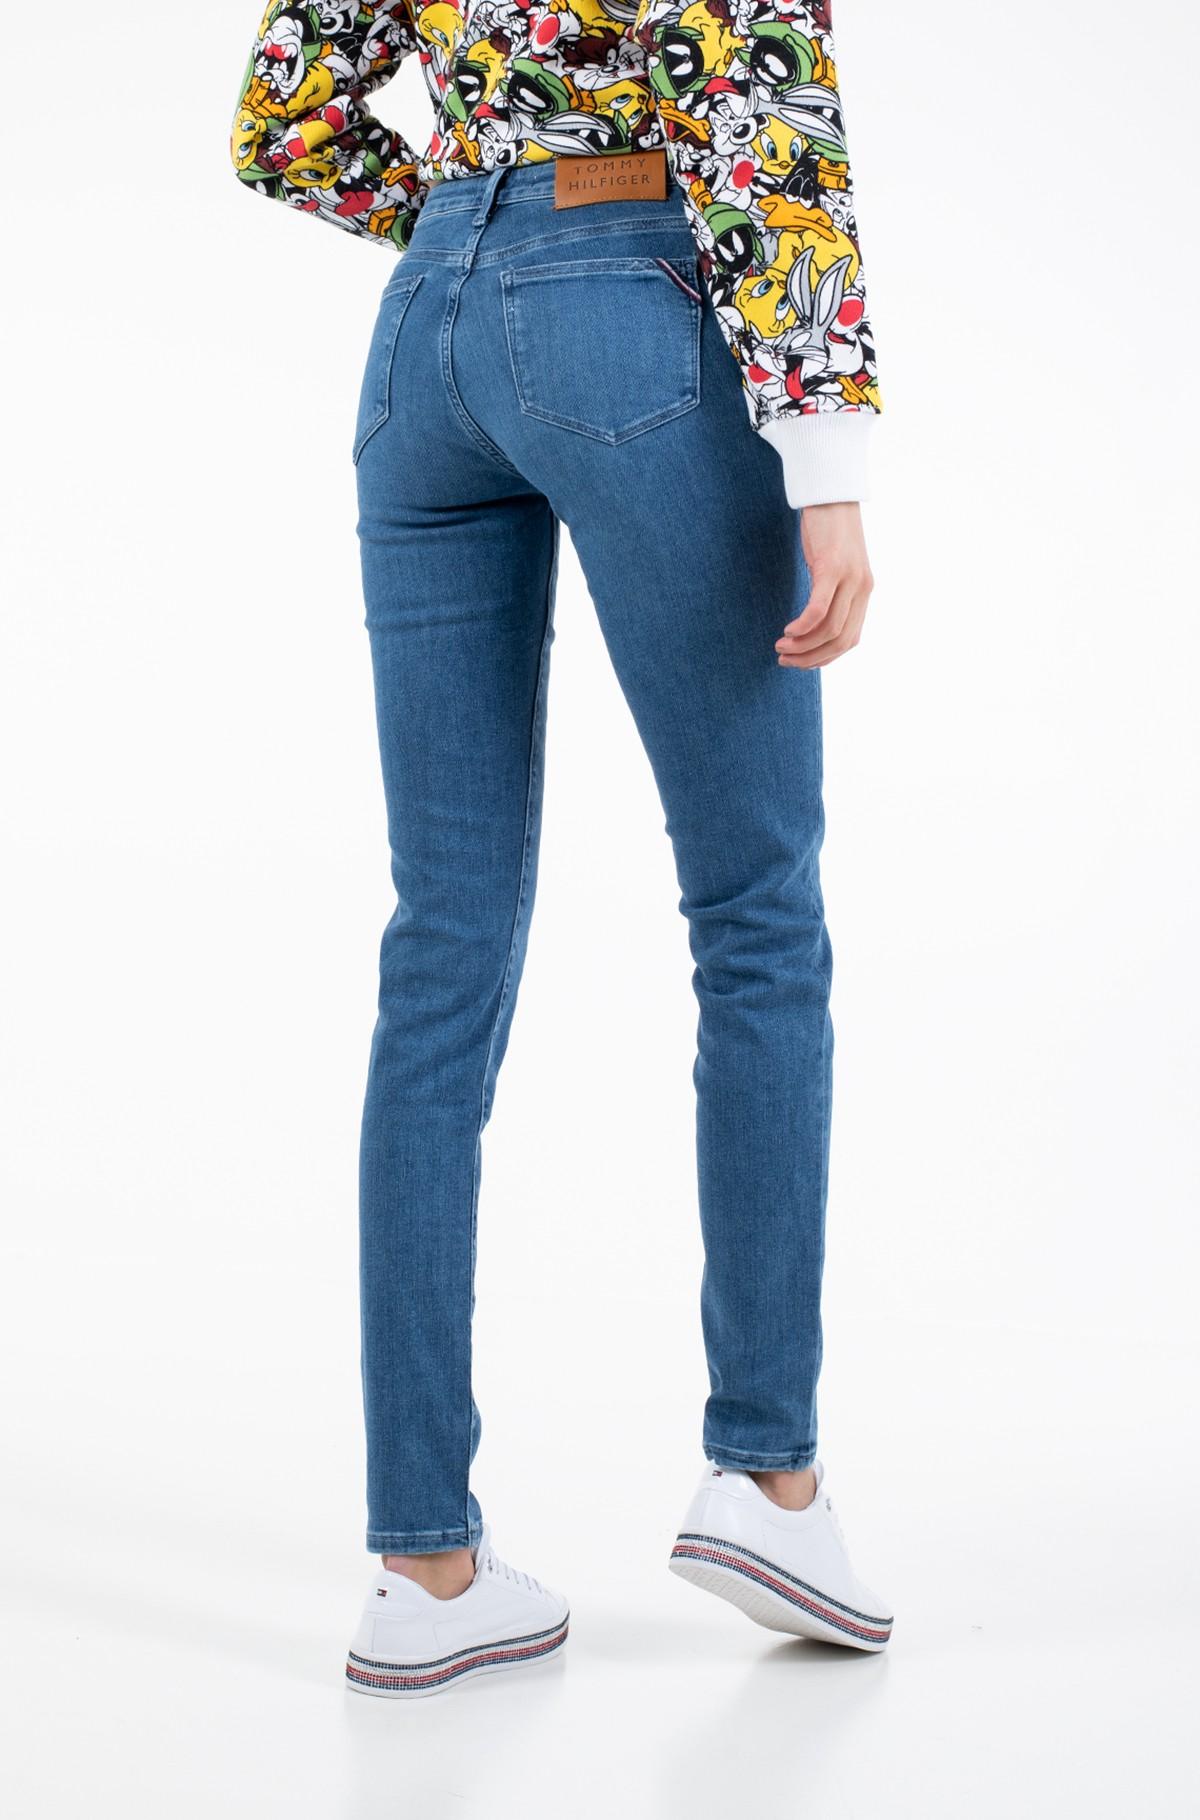 Jeans TH FLEX VENICE SLIM RW BETTY-full-2